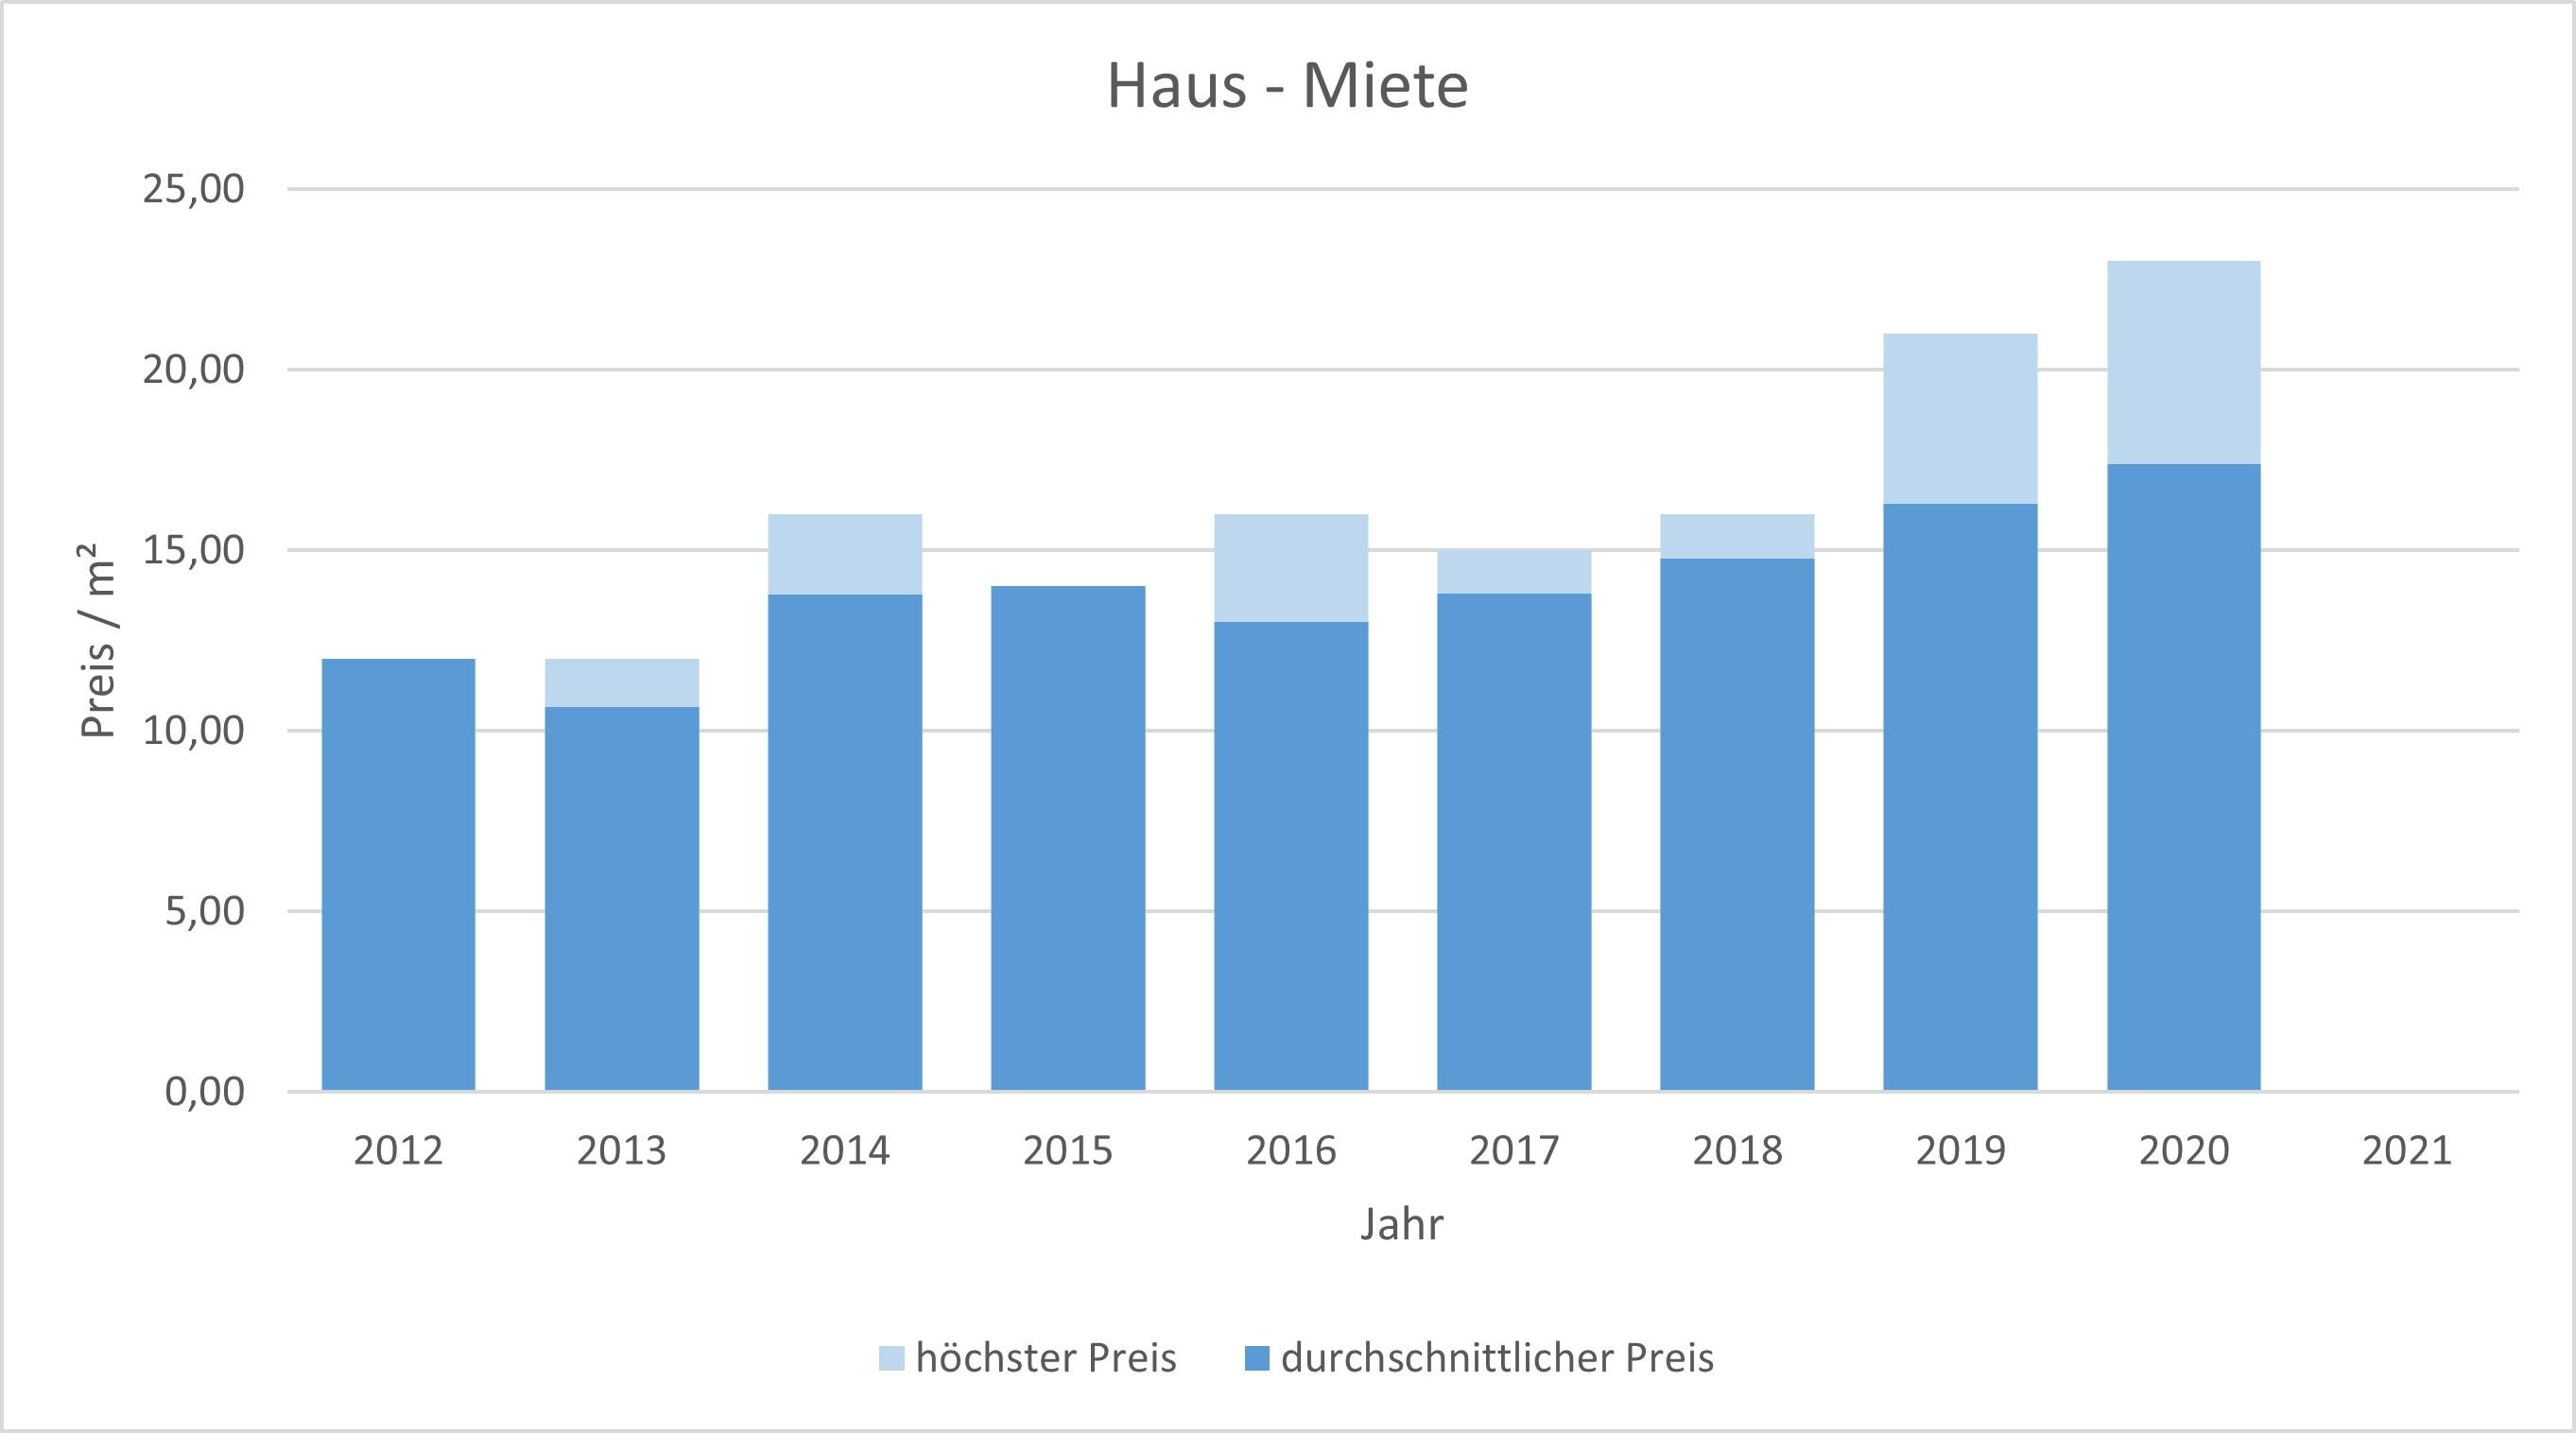 München - Hasenbergl Haus mieten vermieten Preis Bewertung Makler 2019 2020 2021 www.happy-immo.de